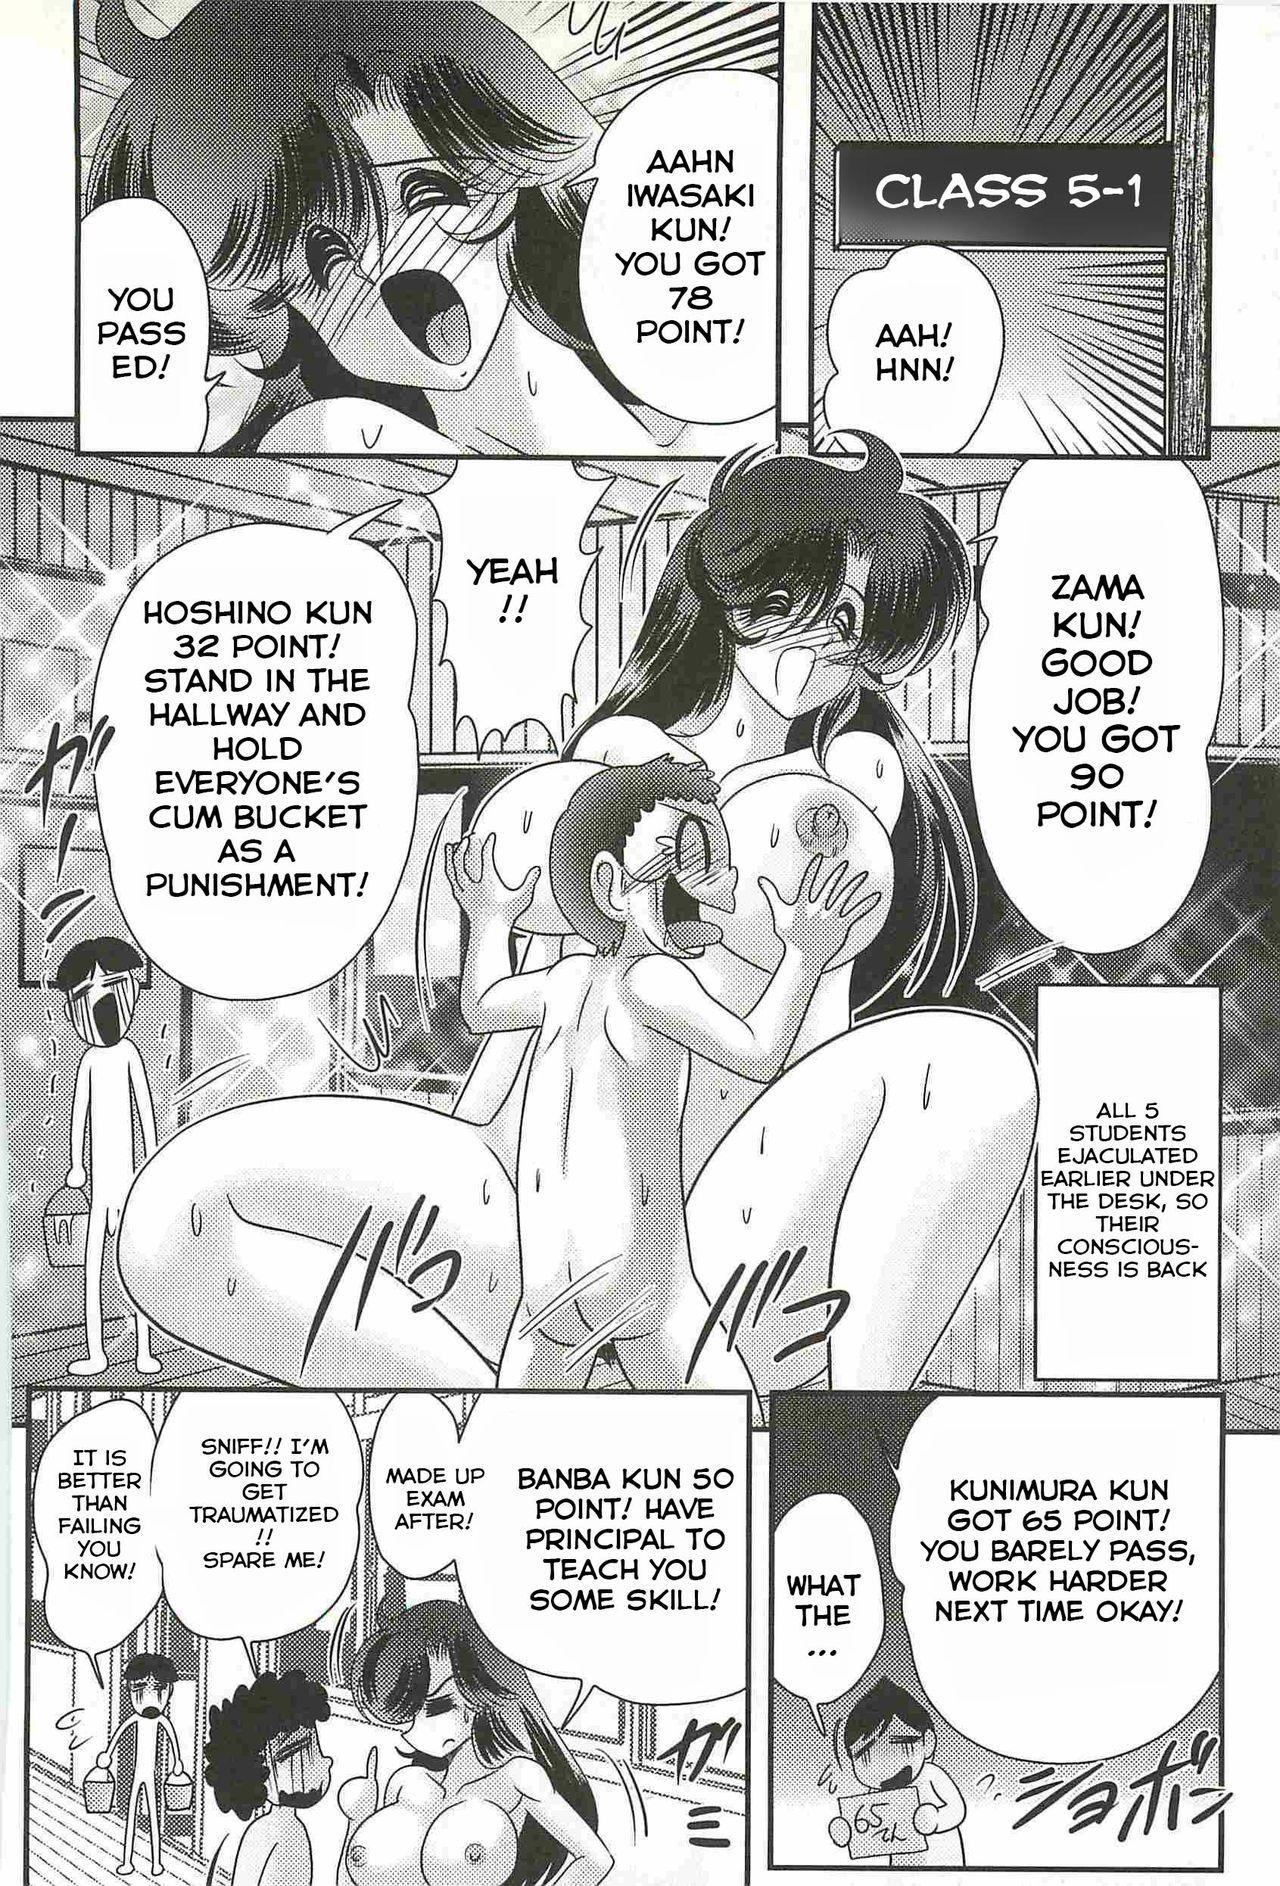 [Kamitou Masaki] Seirei Tokusou Fairy Saber W - Youen Tennyo Den Ch. 5-6 [English] [Hong_Mei_Ling] 13